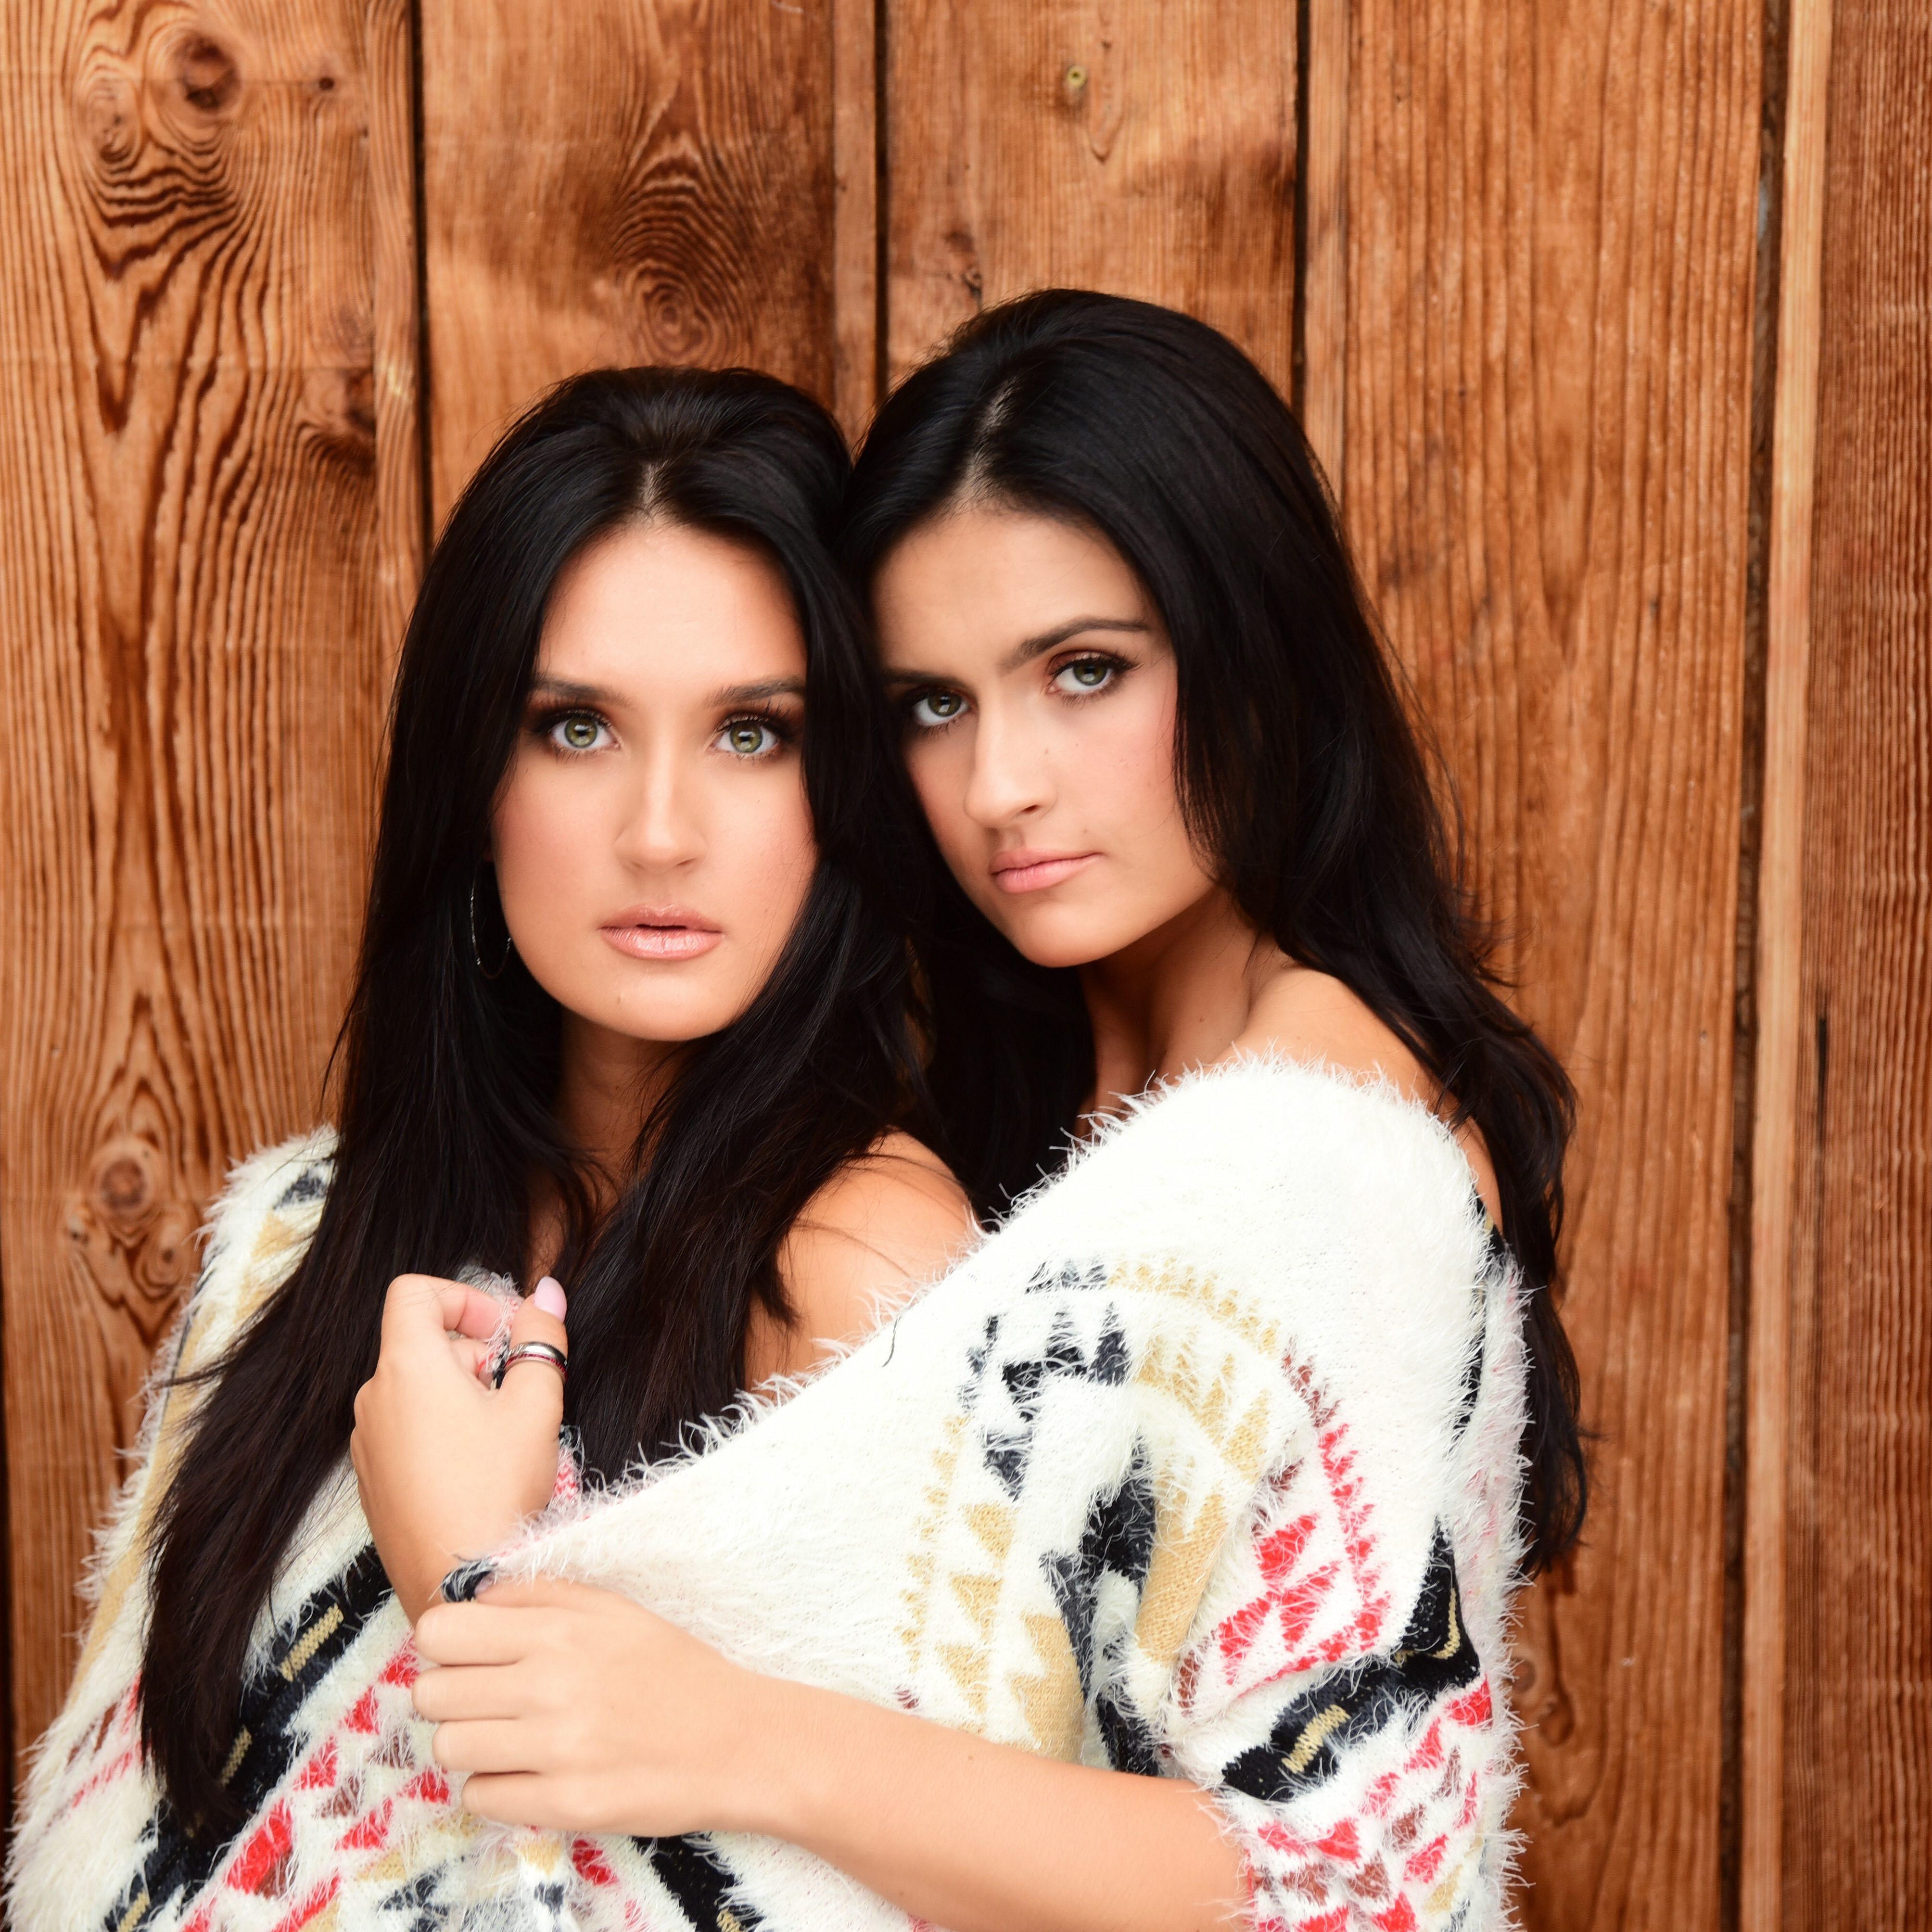 TRR - 20191012 - Media - Presley & Taylor